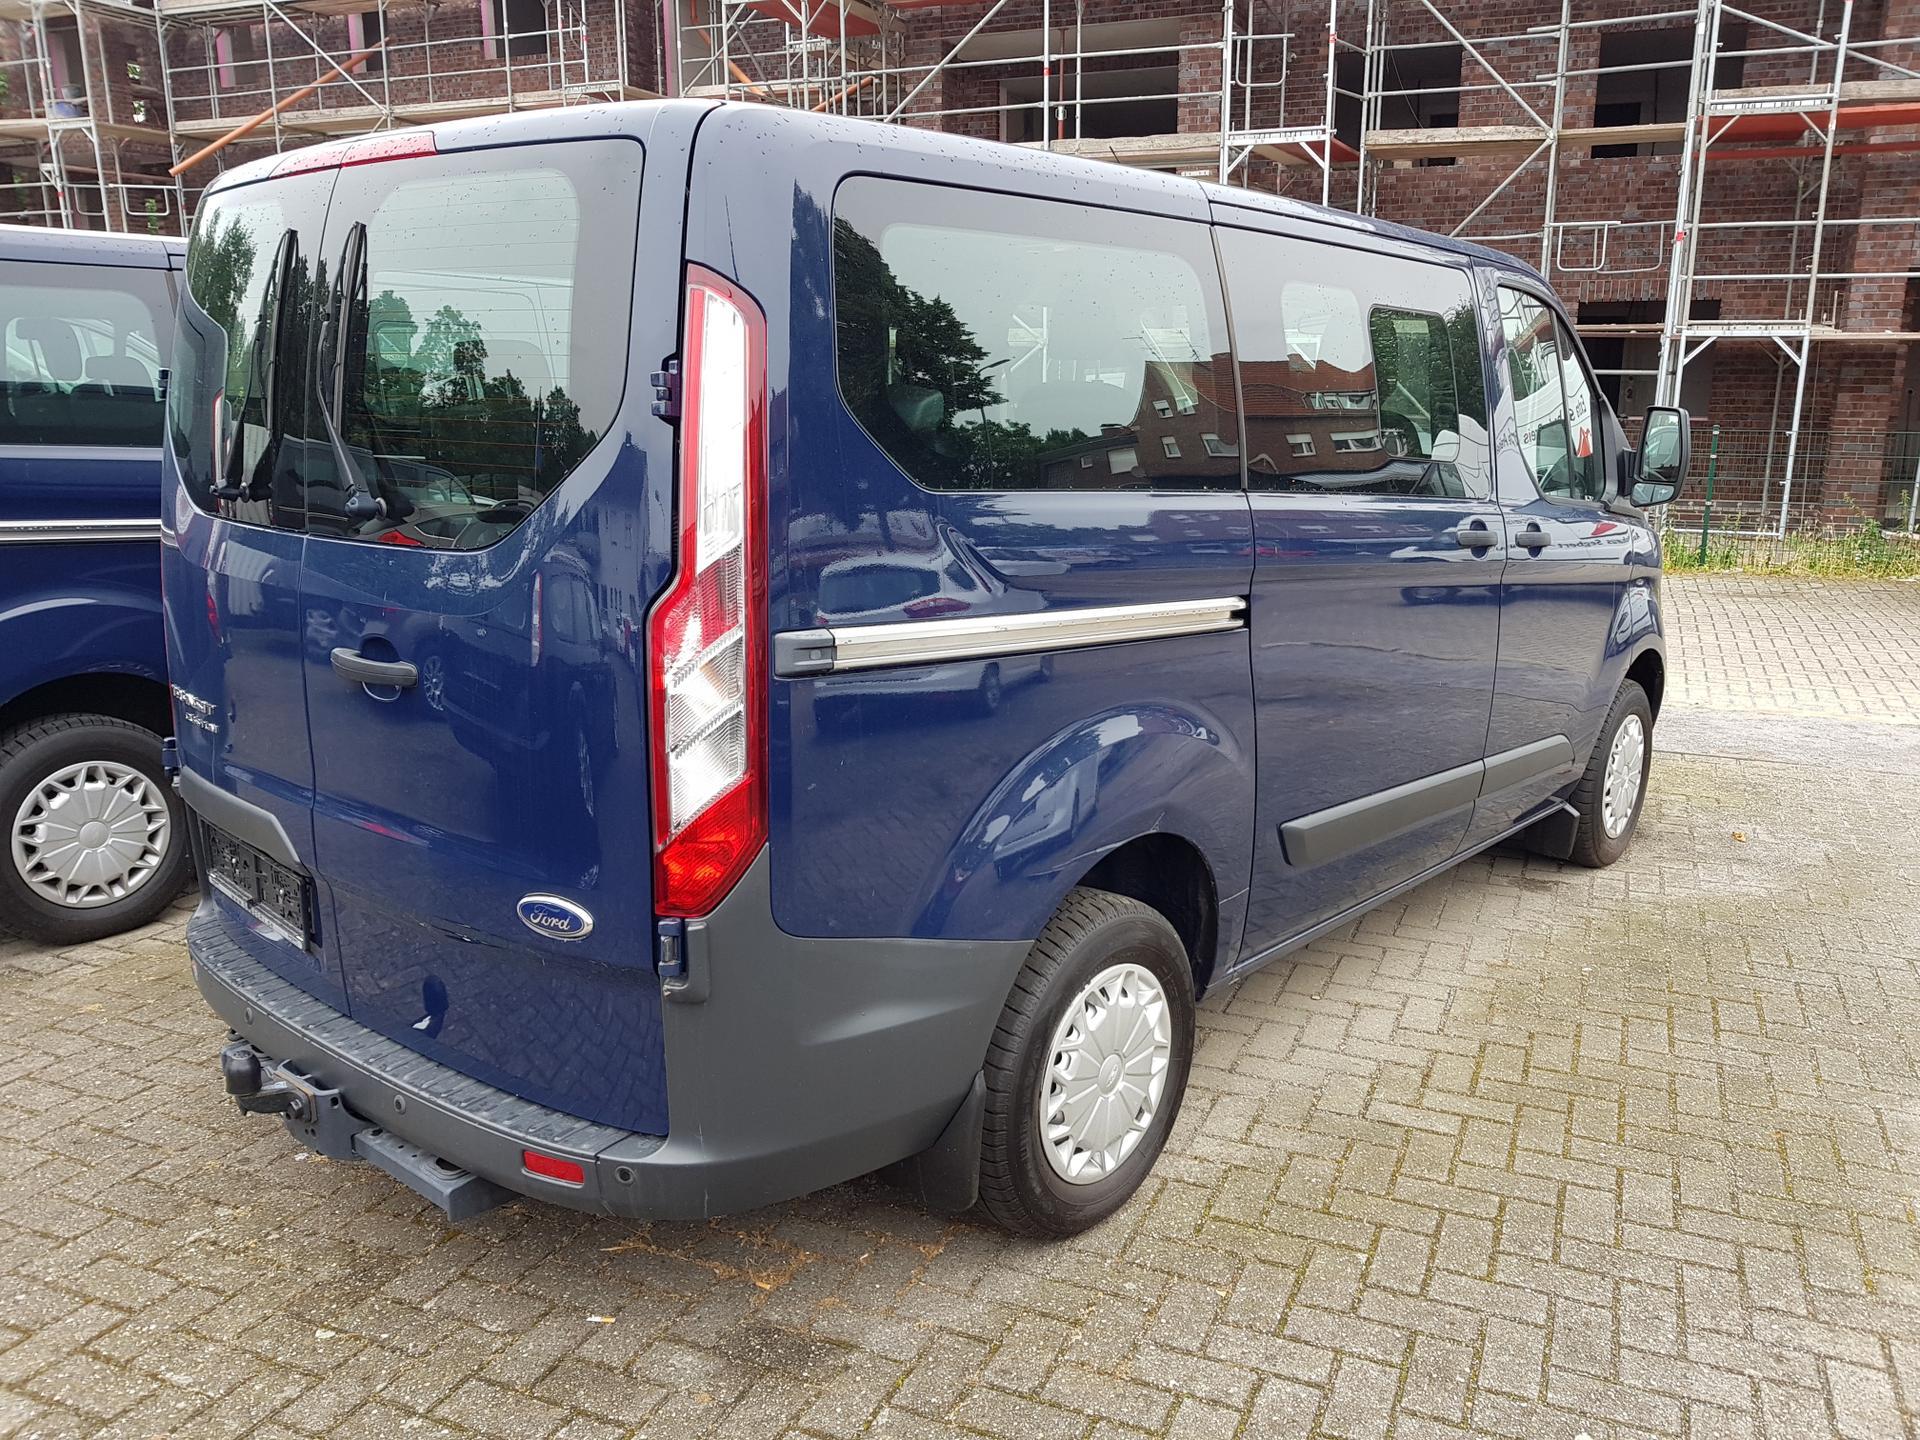 Ford Transit Custom Ft 300 Trend 2 2 L 125 Ps 9 Sitzer Ahk L1h1 Eu